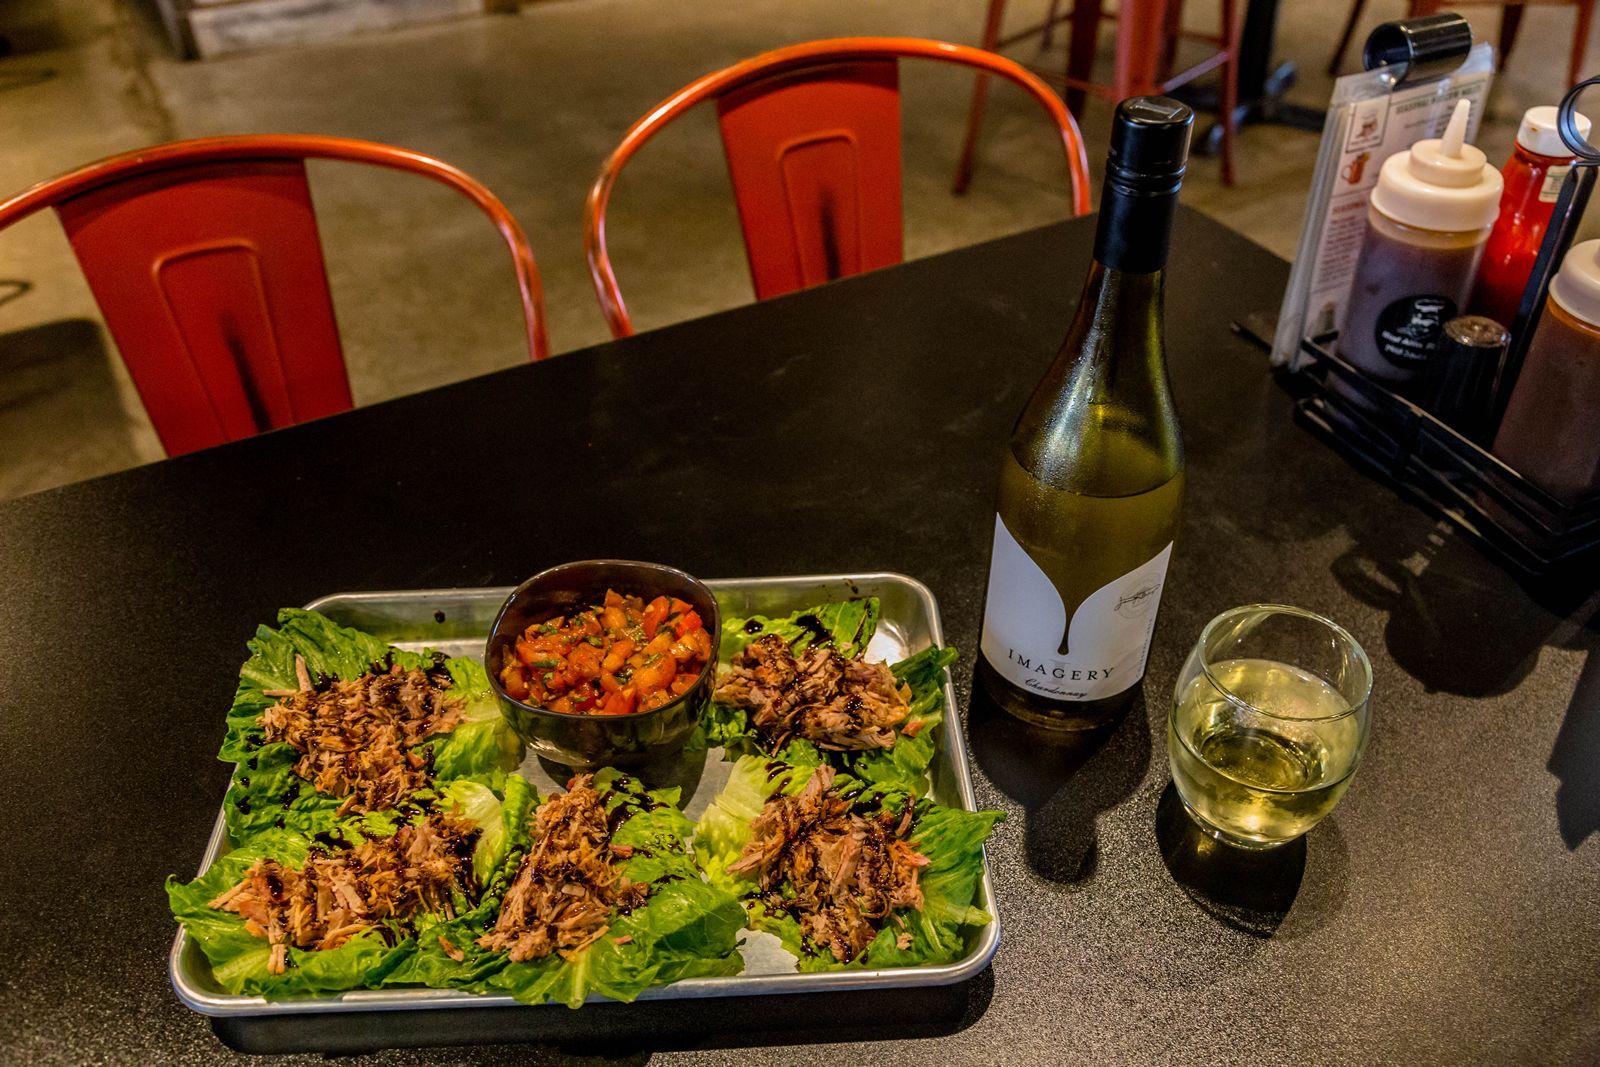 West Alley BBQ & Smokehouse Add Appetizers to Award-Winning Menu